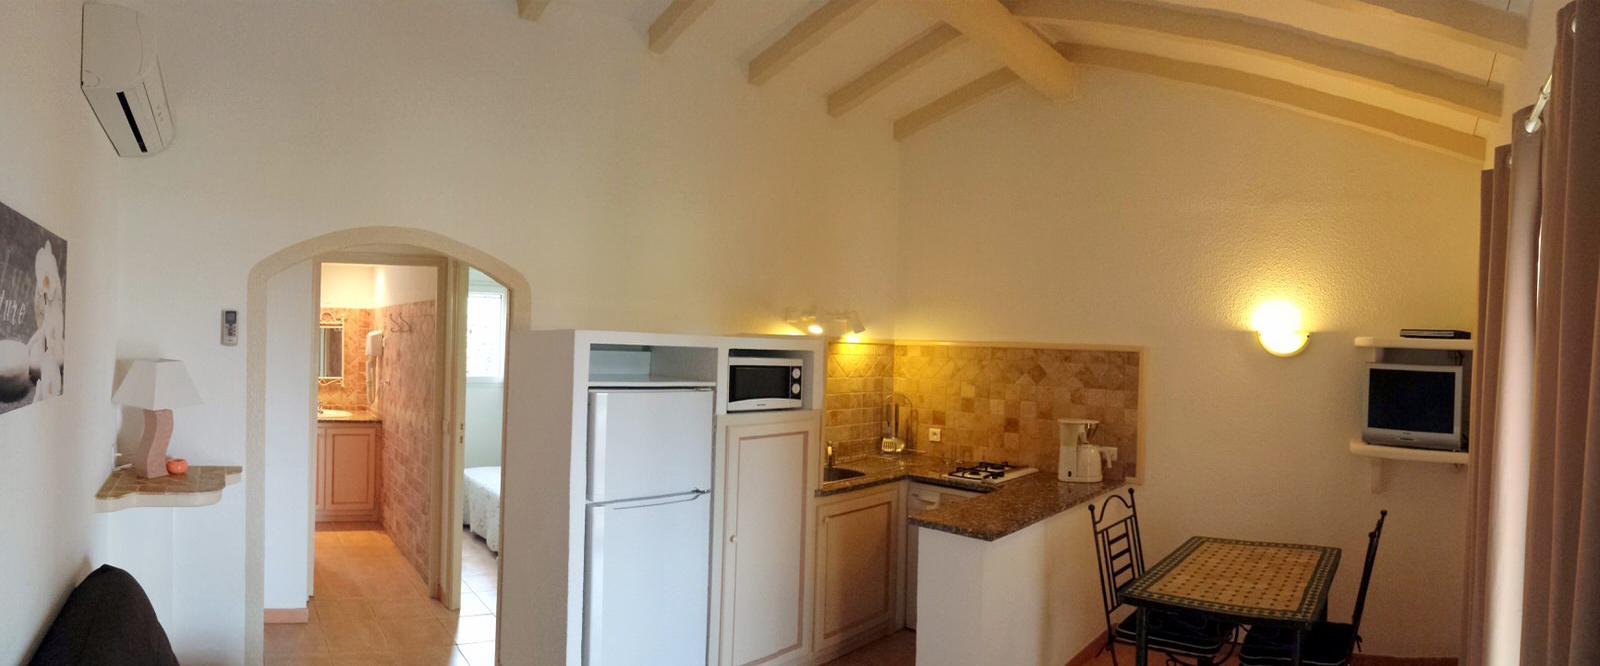 Vacances dans une Mini-Villa Porto-Vecchio Ste Lucie